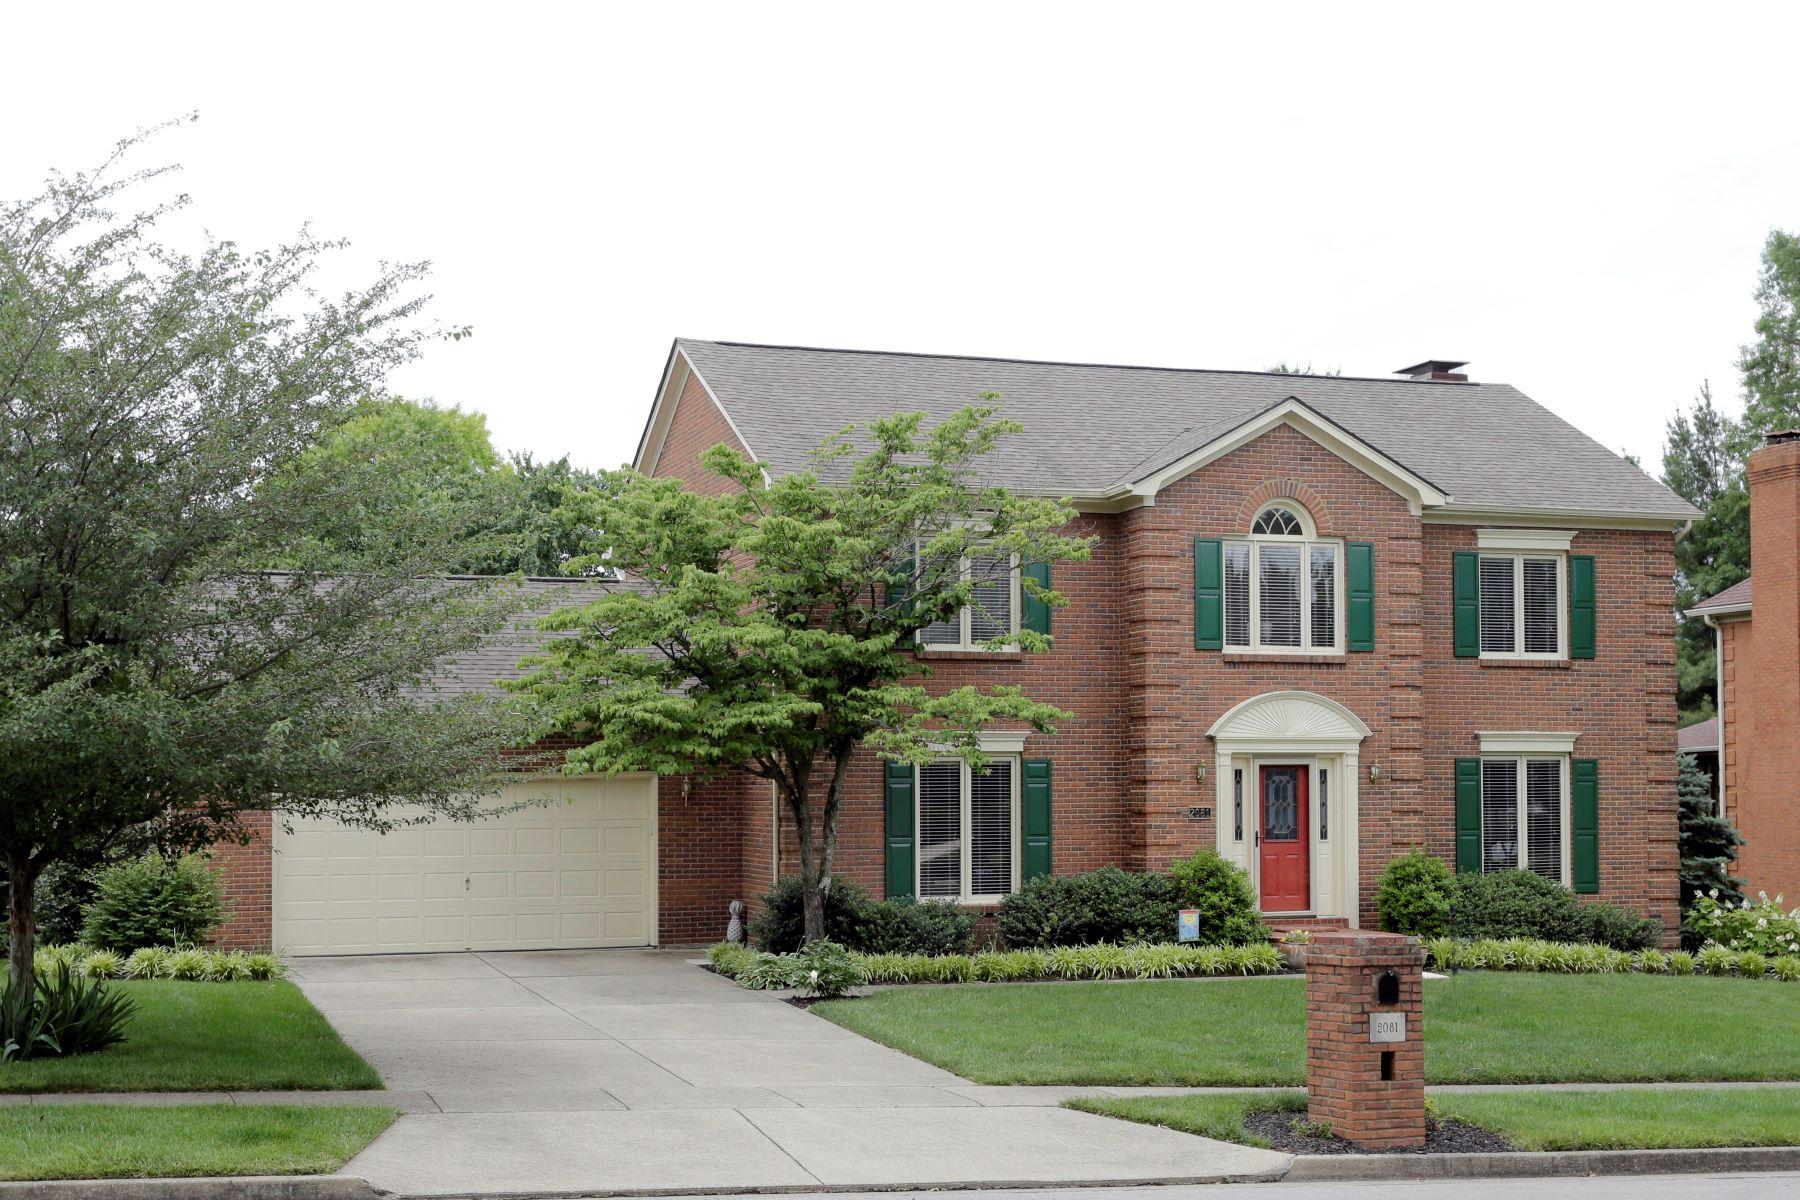 Single Family Home for Sale at 2081 Bahama Road Lexington, Kentucky 40509 United States